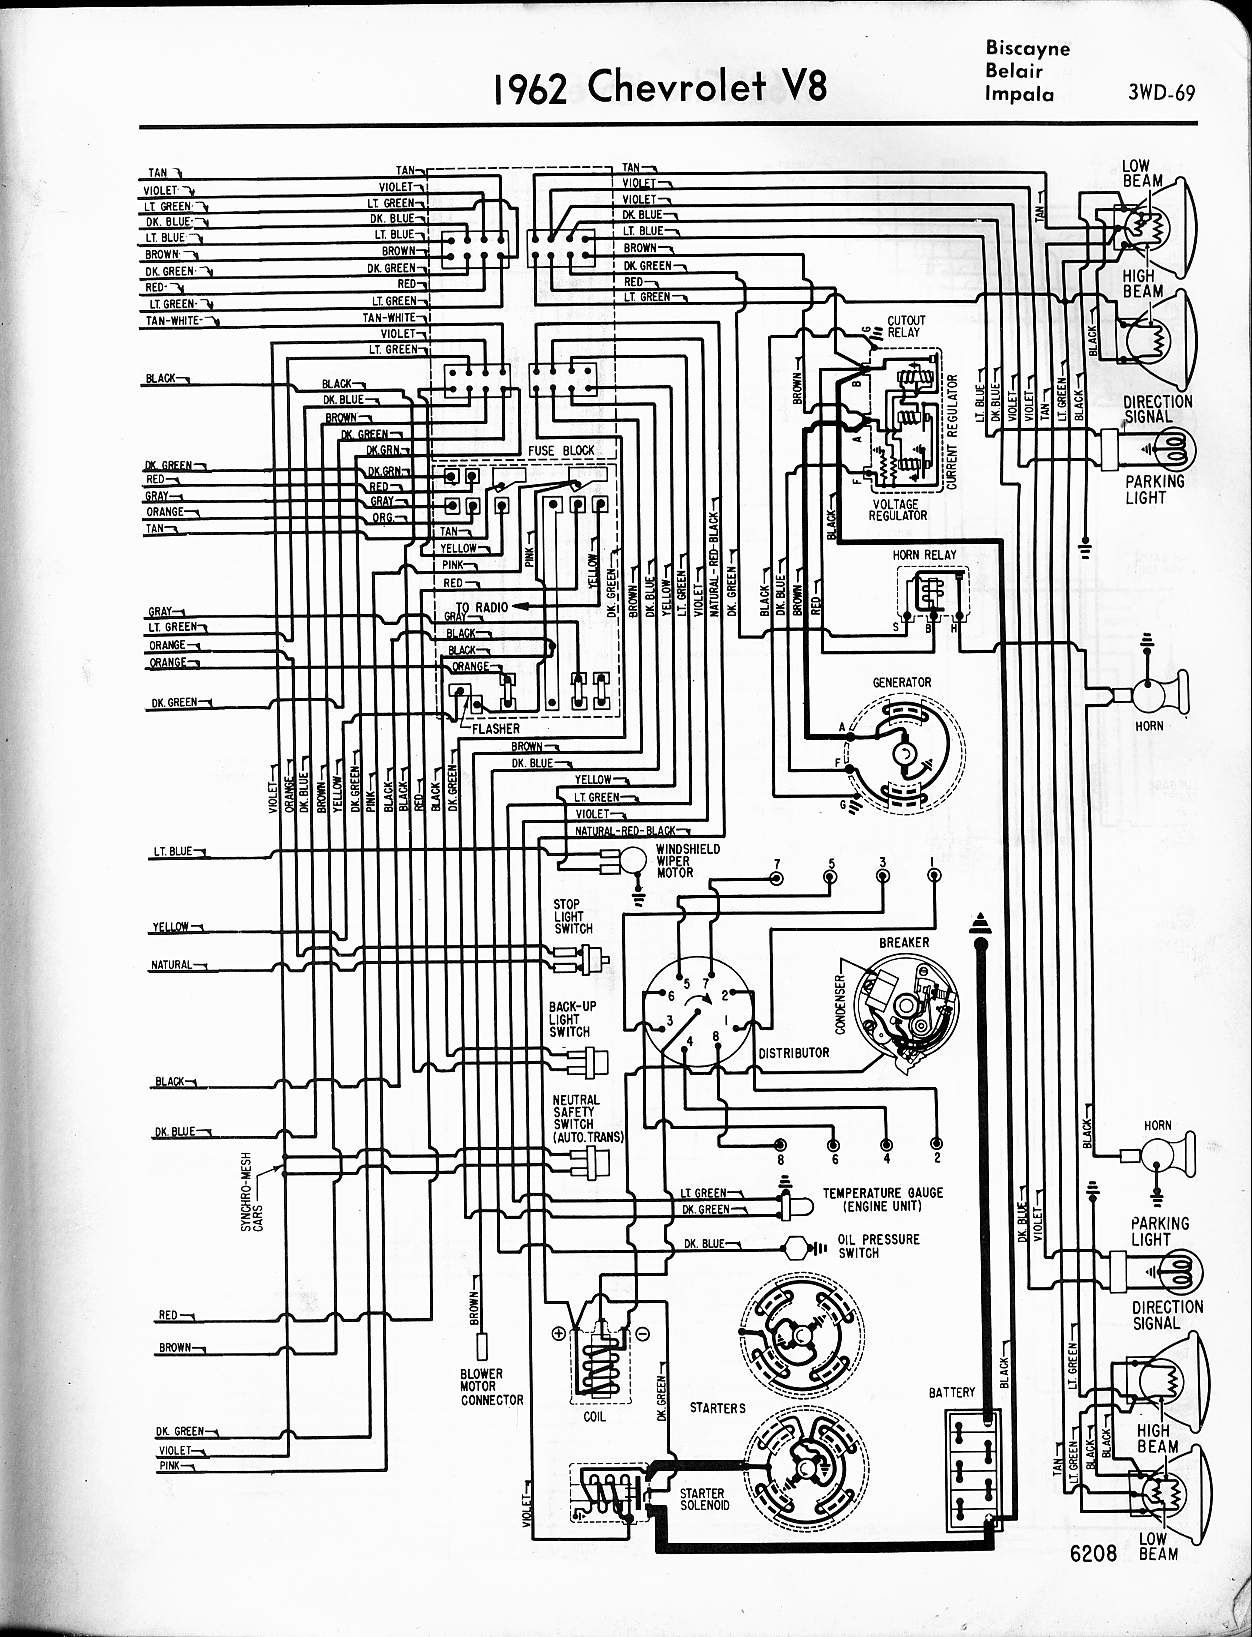 Marvelous Laminatedfull Wiring Diagram 67 GMC Pickup Pictures - Best ...